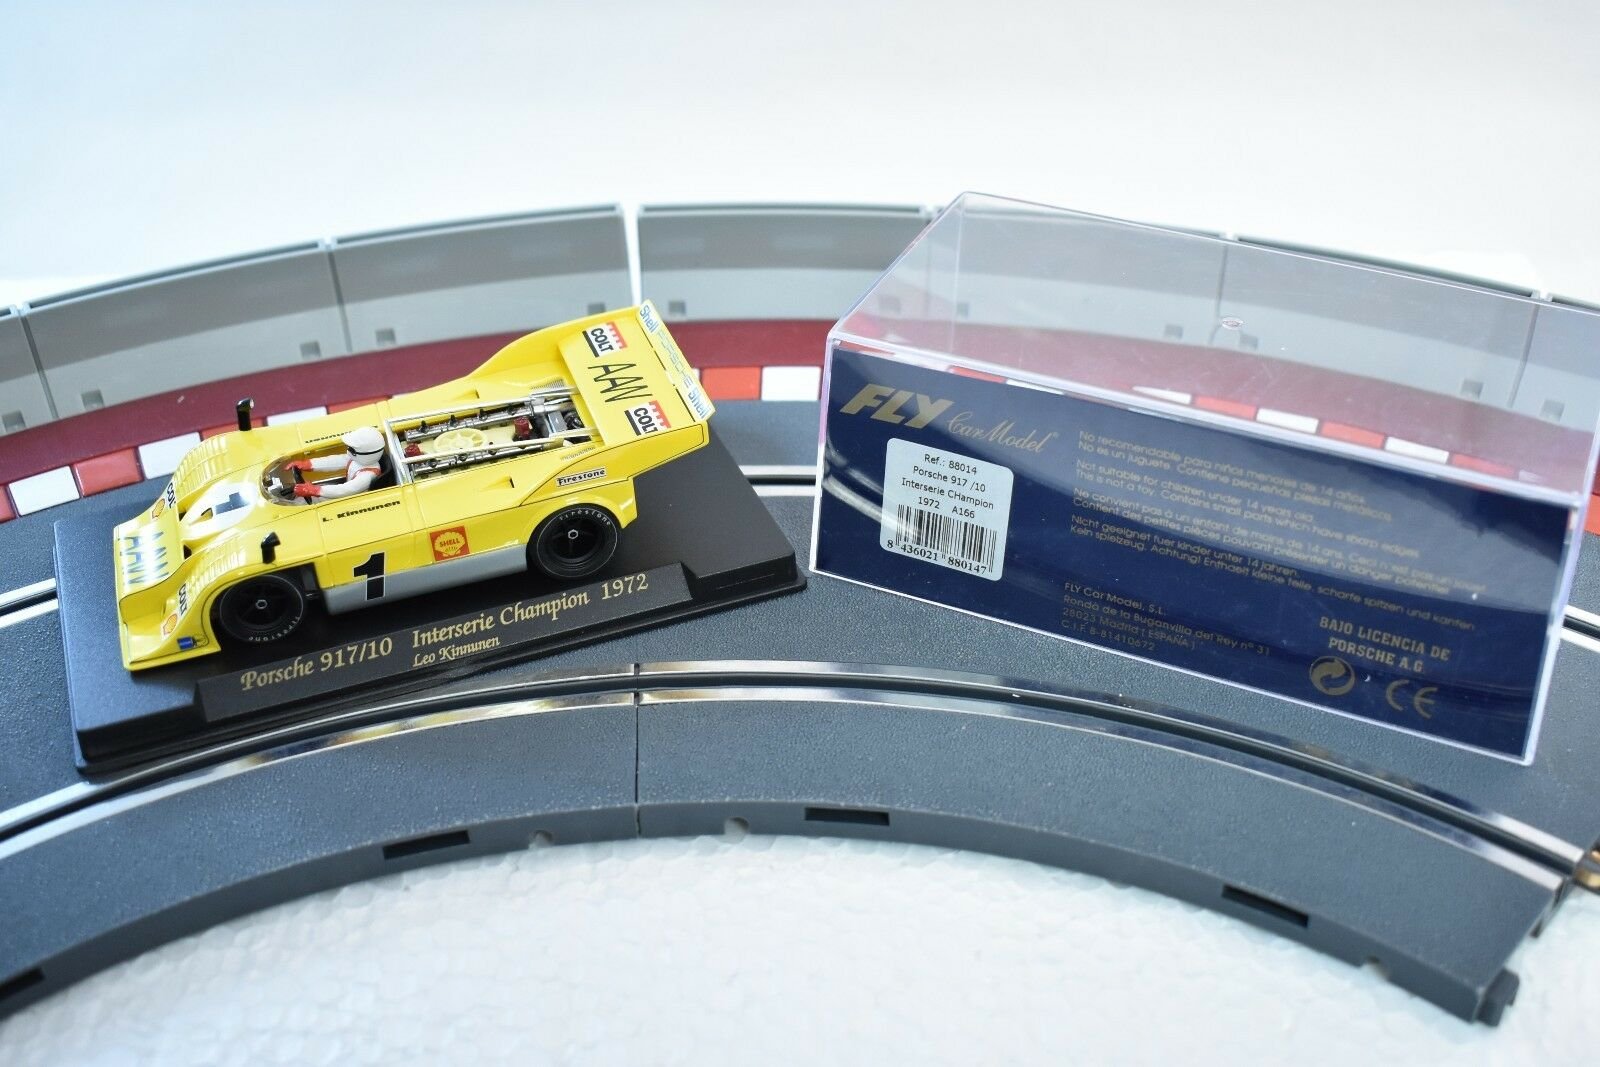 88014 FLY CAR MODEL 1 32 SCALE PORSCHE 917 10 INTERSERIE CHAMPION 1972 A166